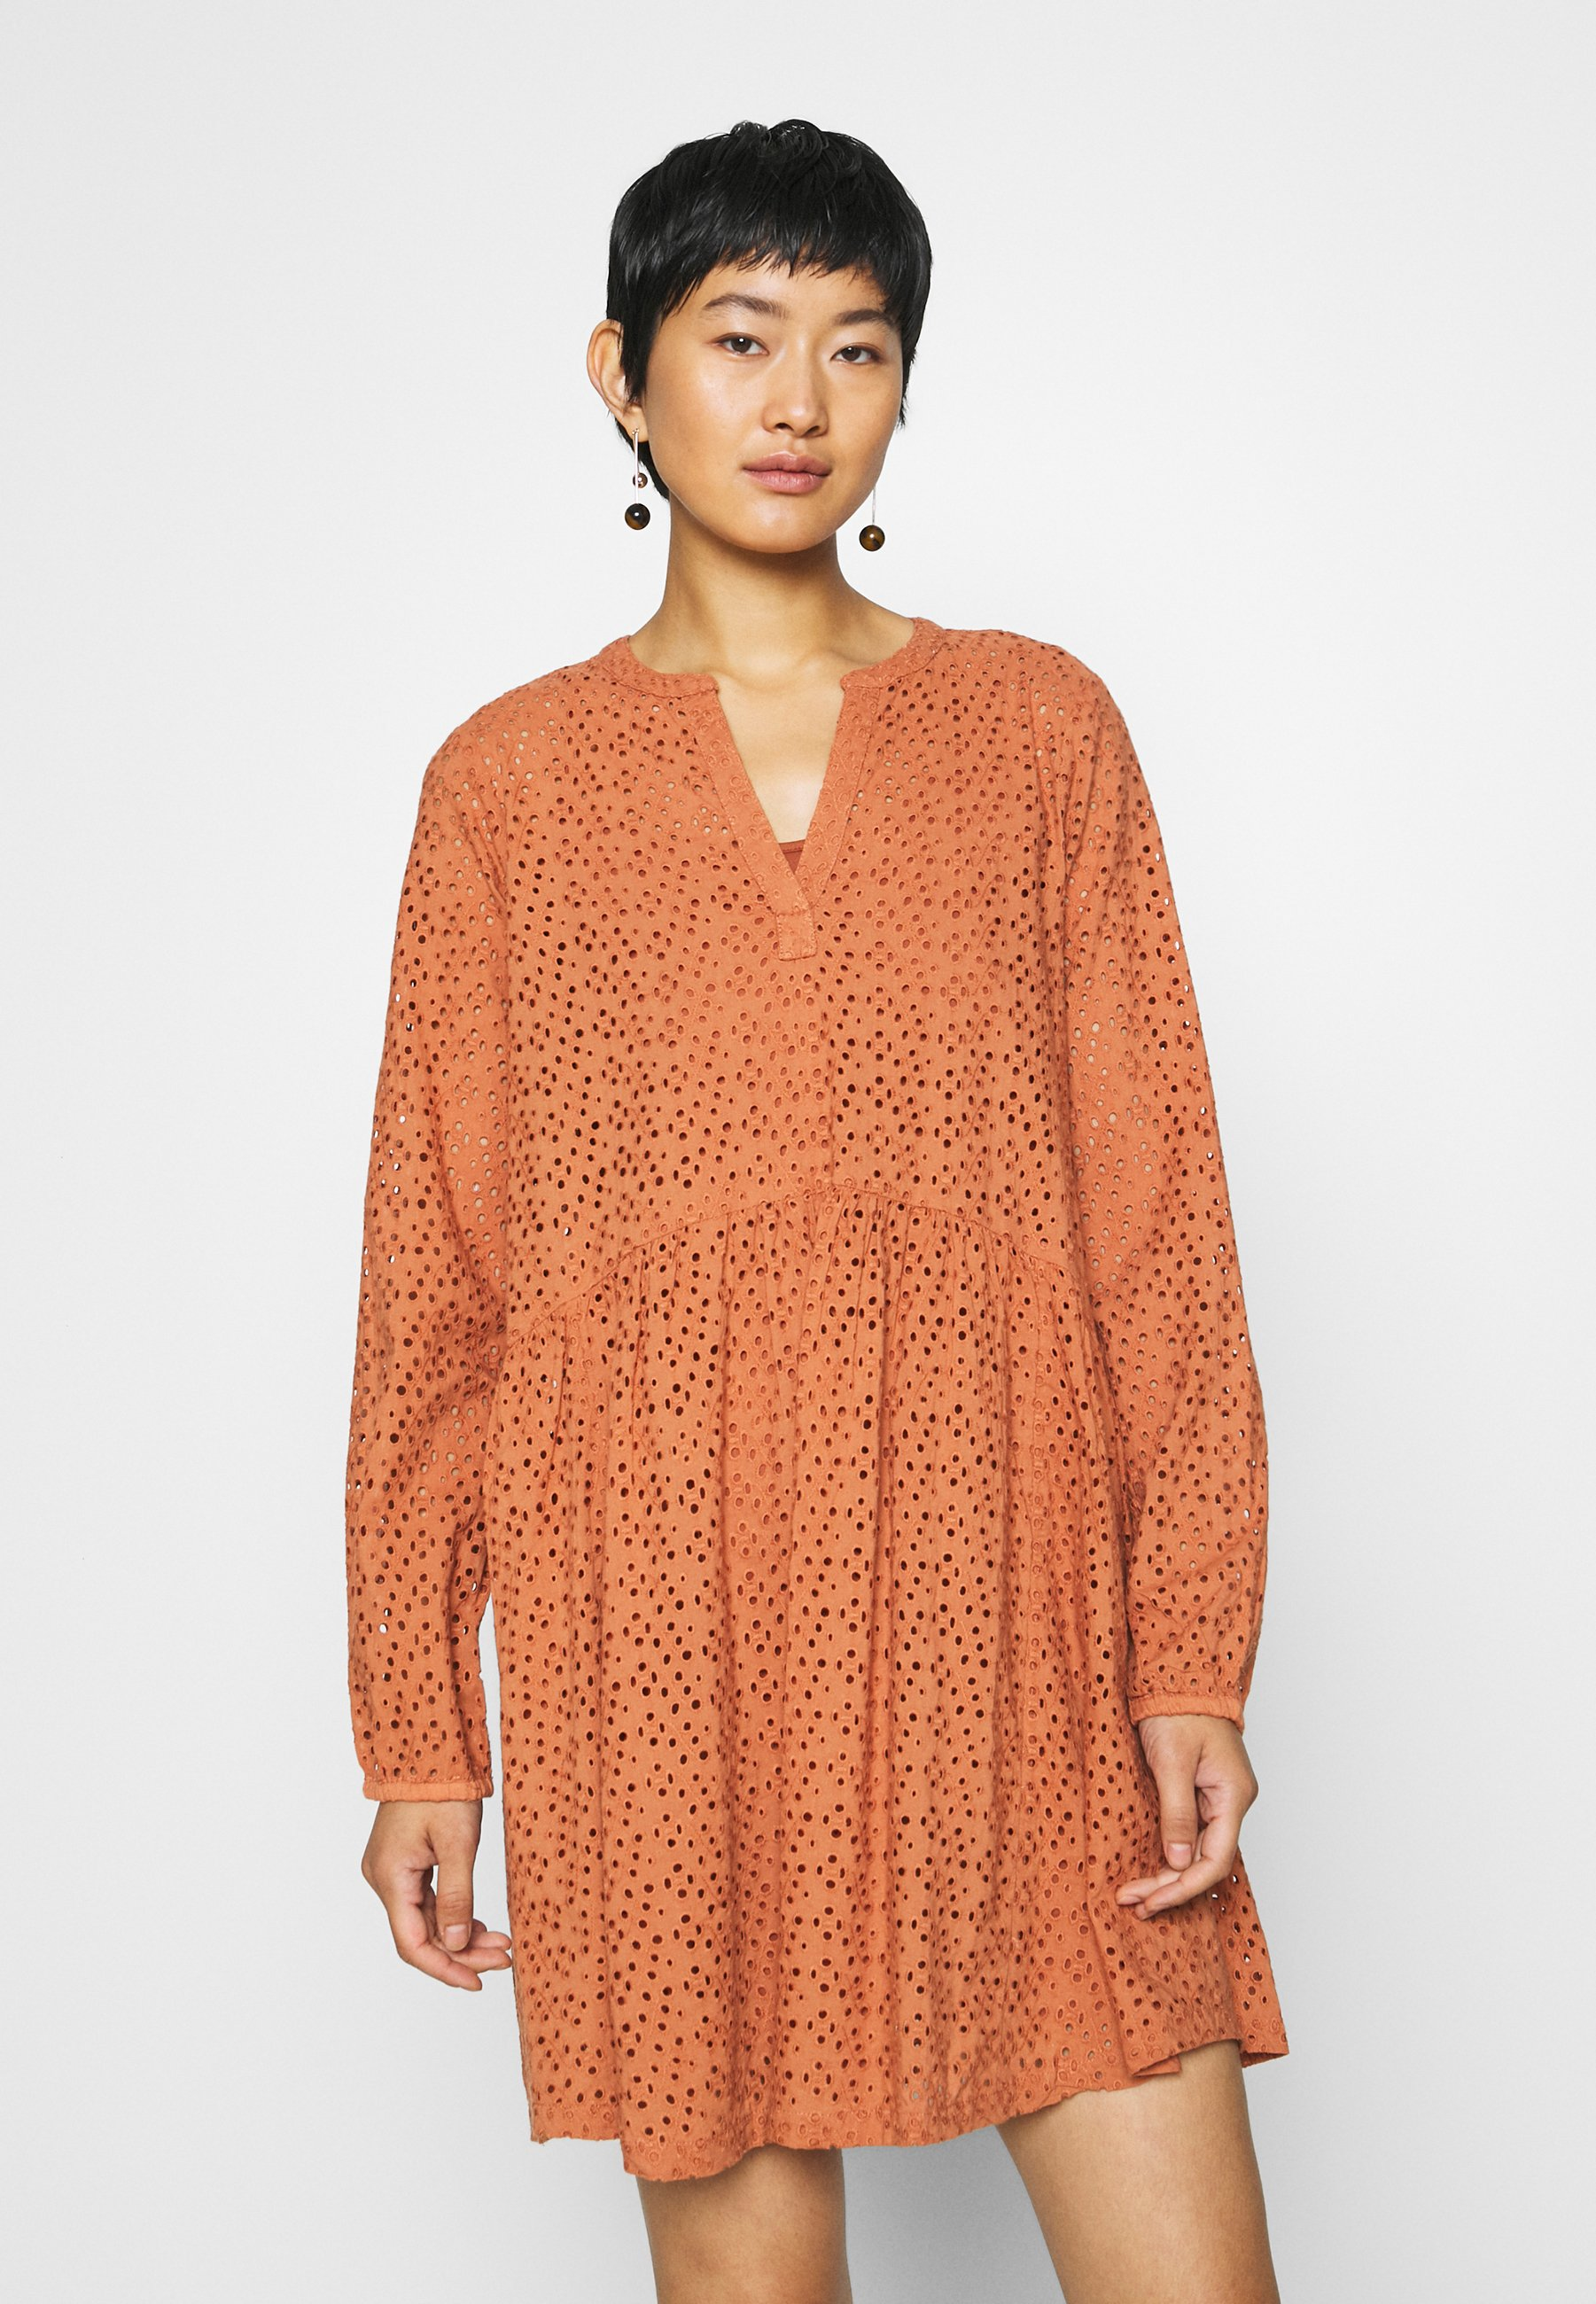 2020 Cool Recommend Cheap Women's Clothing Kaffe BELL Tunic sierra JtZnBNeVJ eVmZa55Bw